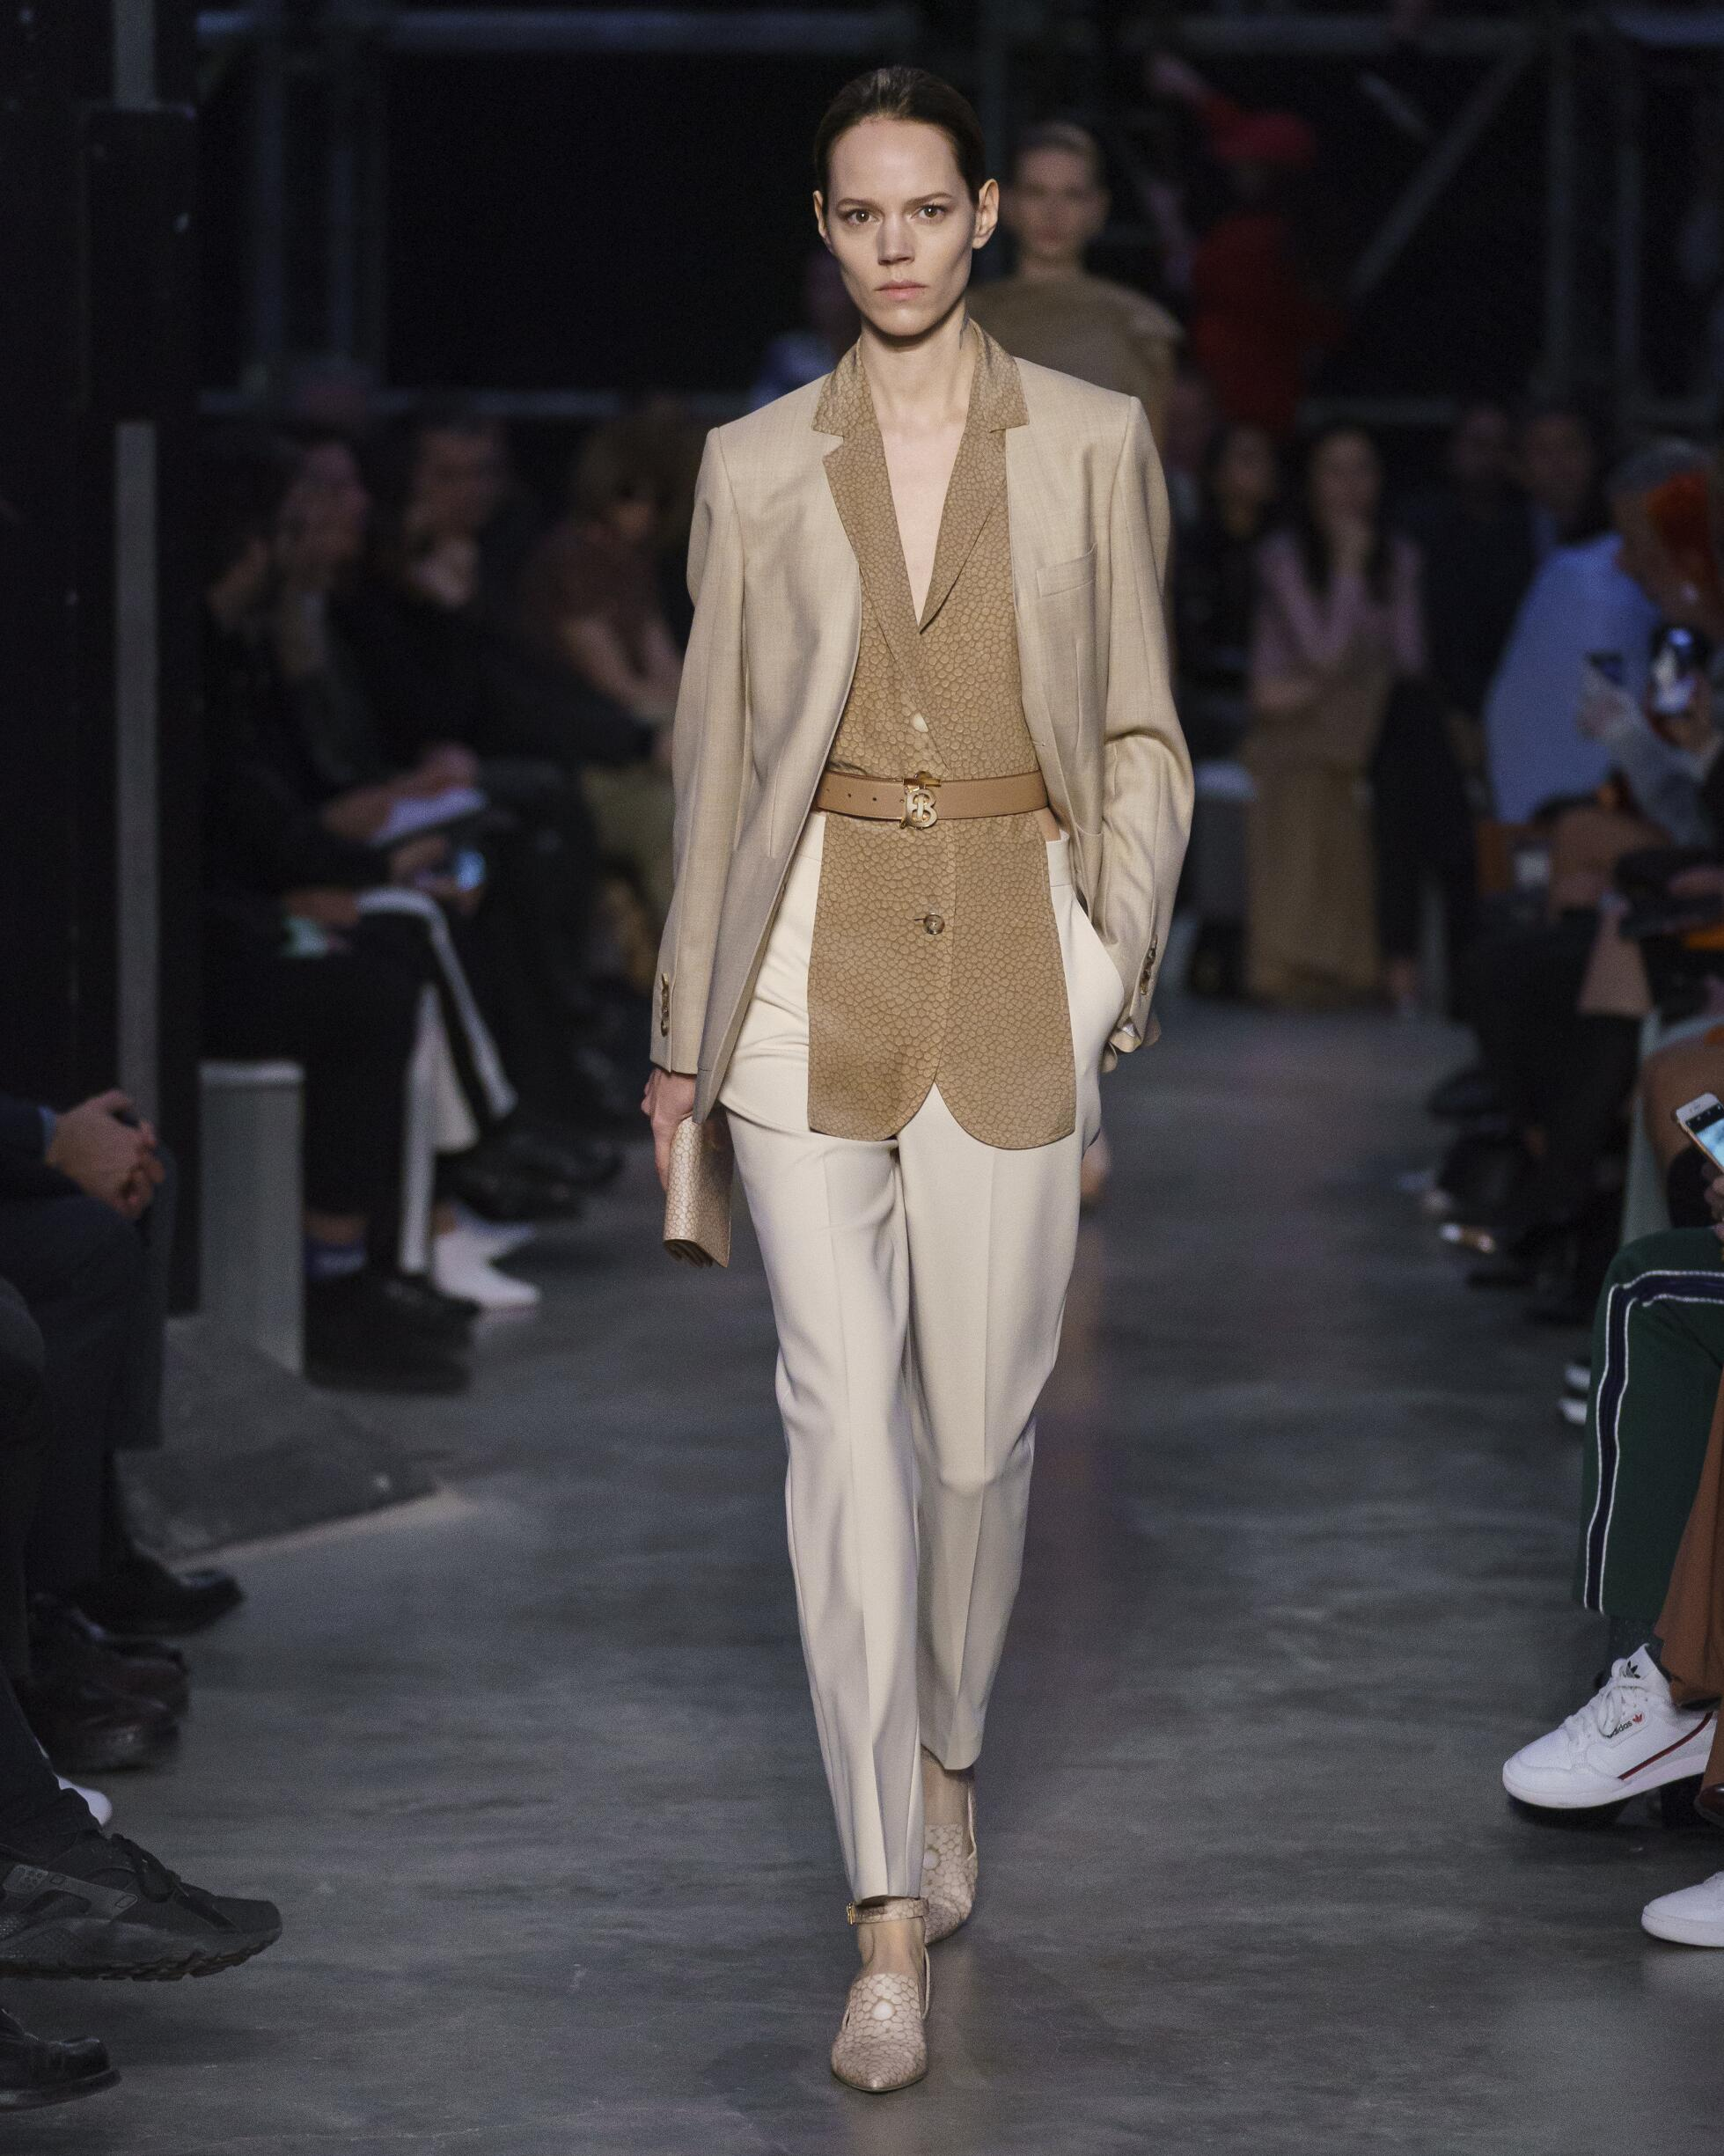 FW 2019 Burberry Show London Fashion Week Womenswear